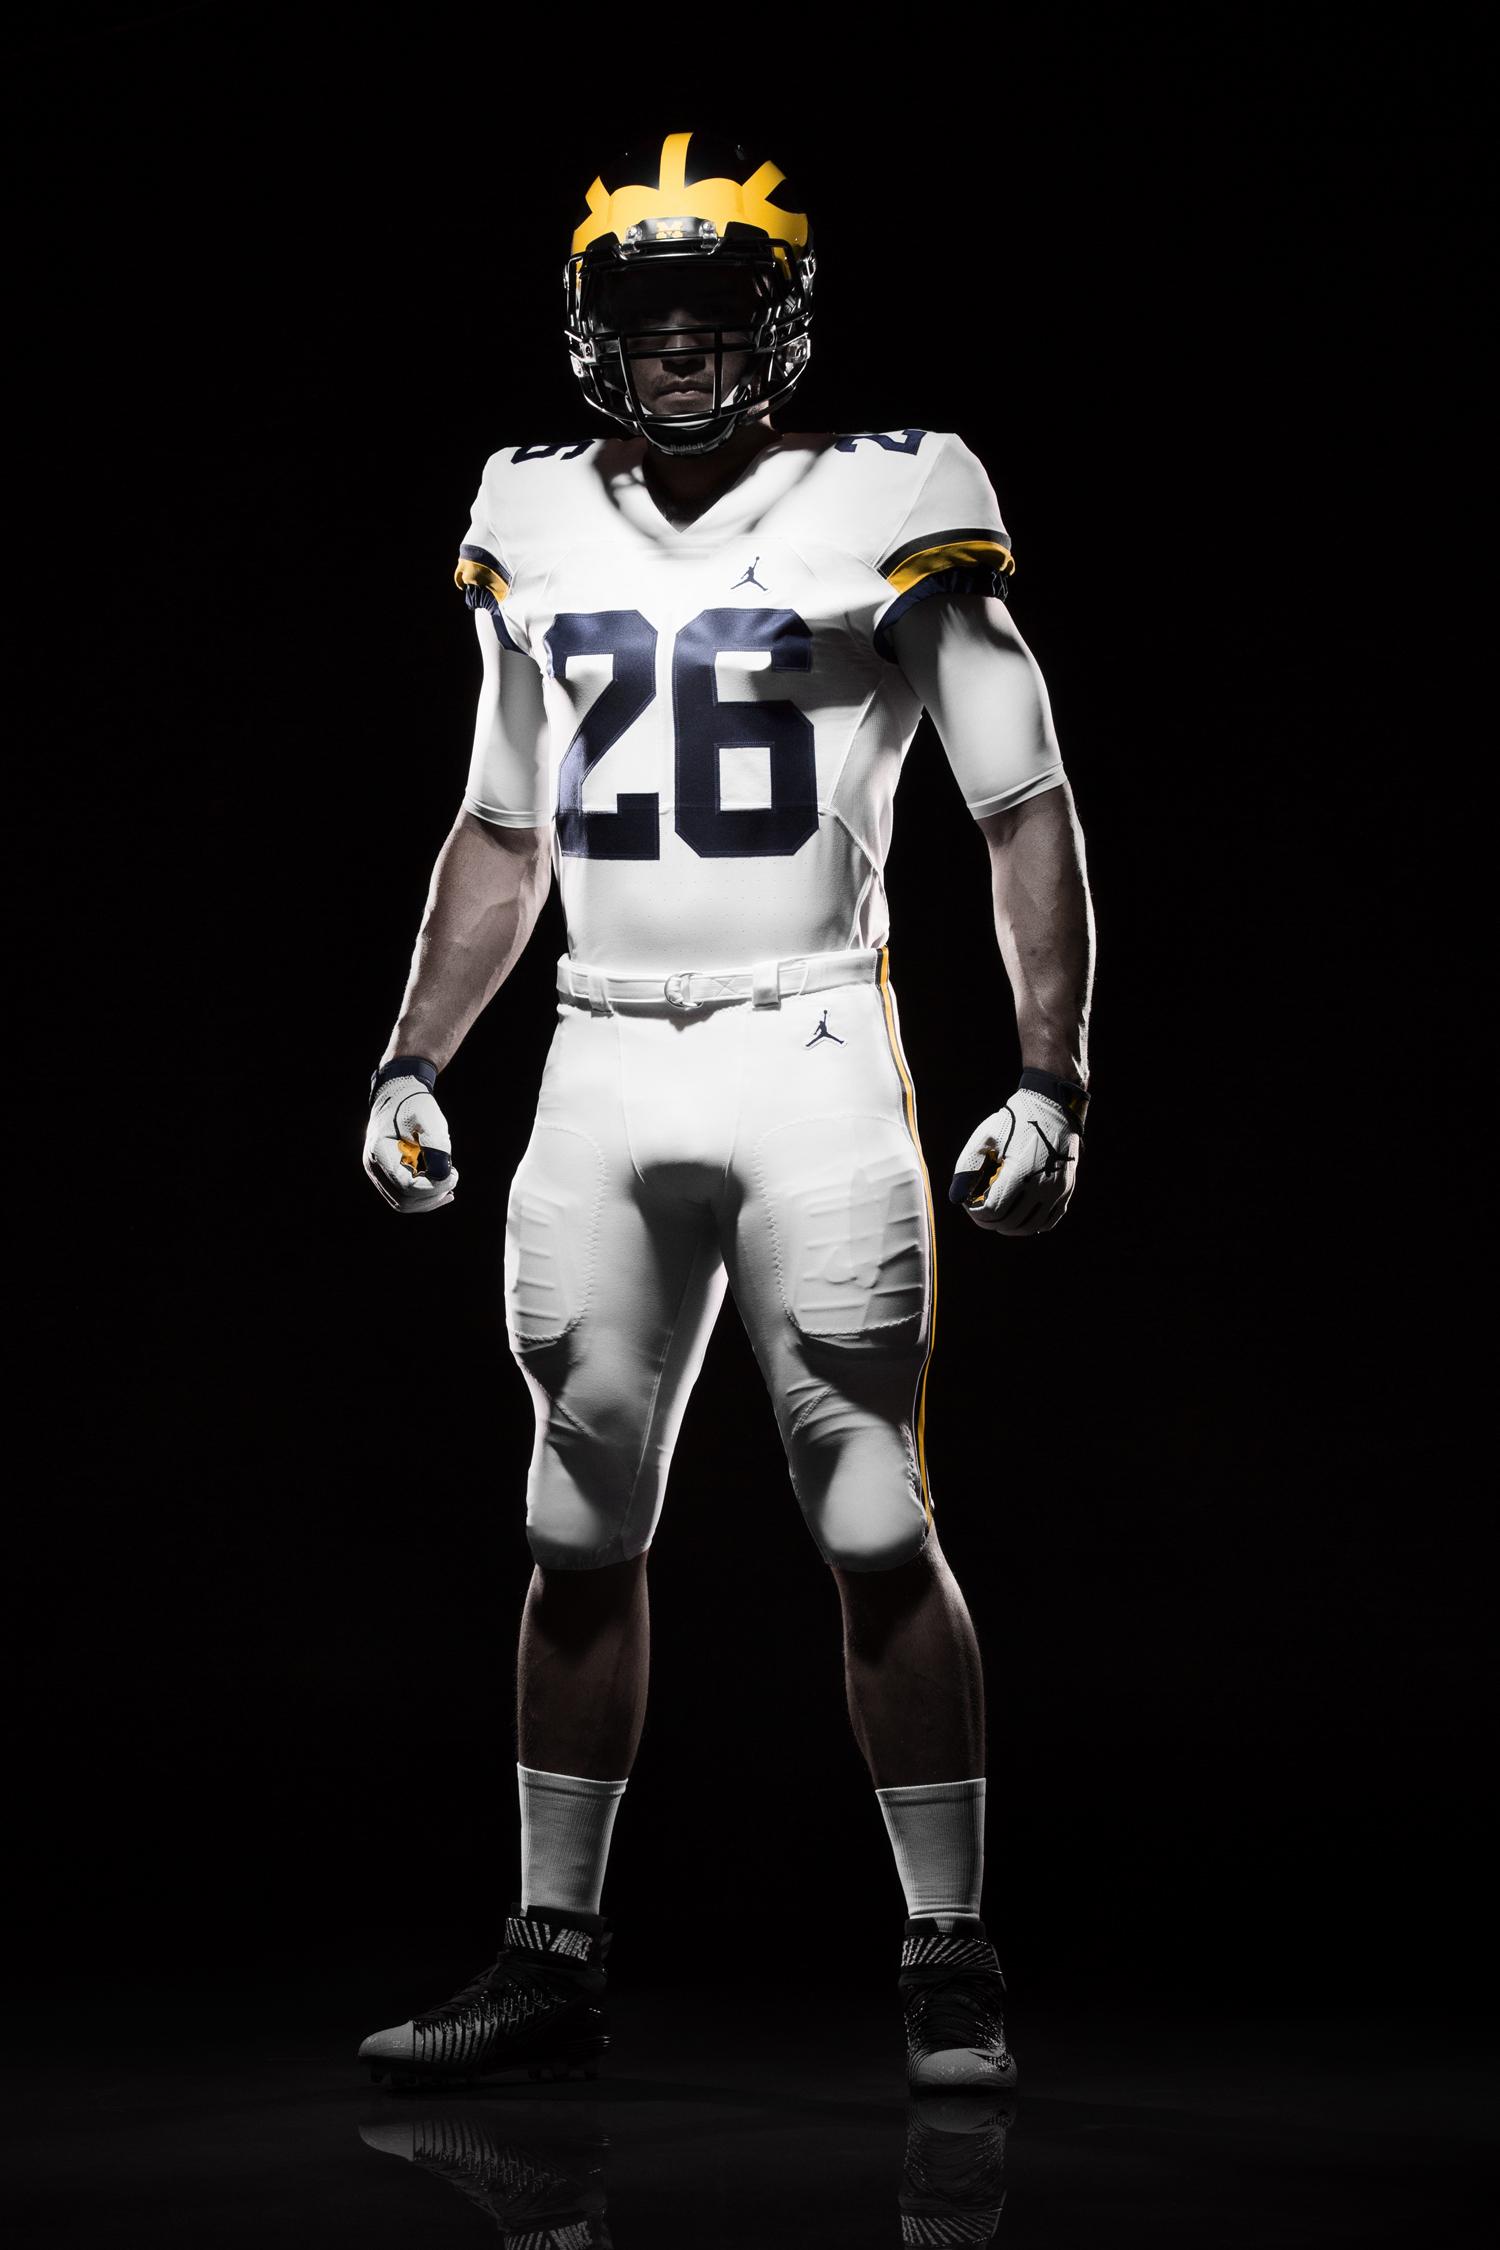 cf100cd92 Air Jordan uniforms for the Michigan Wolverines football team